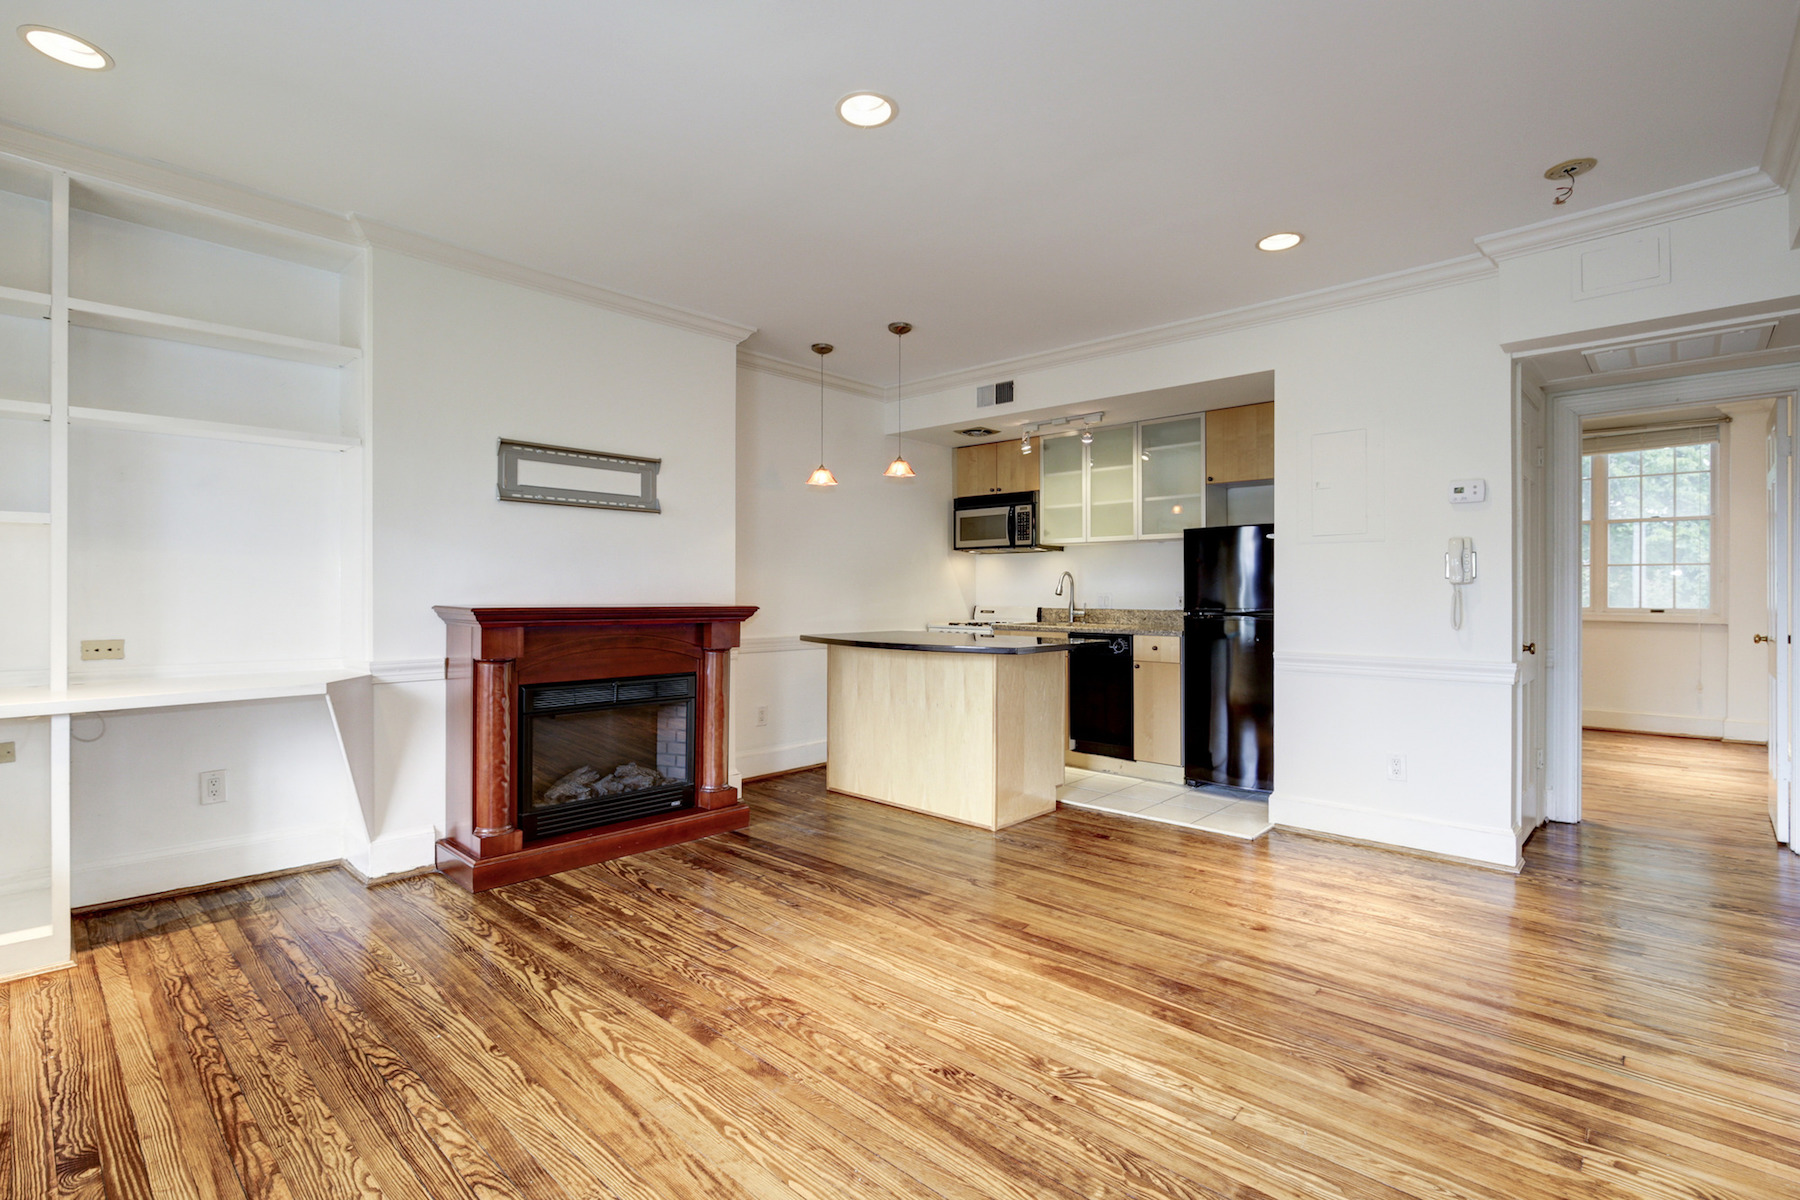 Additional photo for property listing at 3239 N Street Nw 11, Washington  Washington, Περιφερεια Τησ Κολουμπια 20007 Ηνωμενεσ Πολιτειεσ